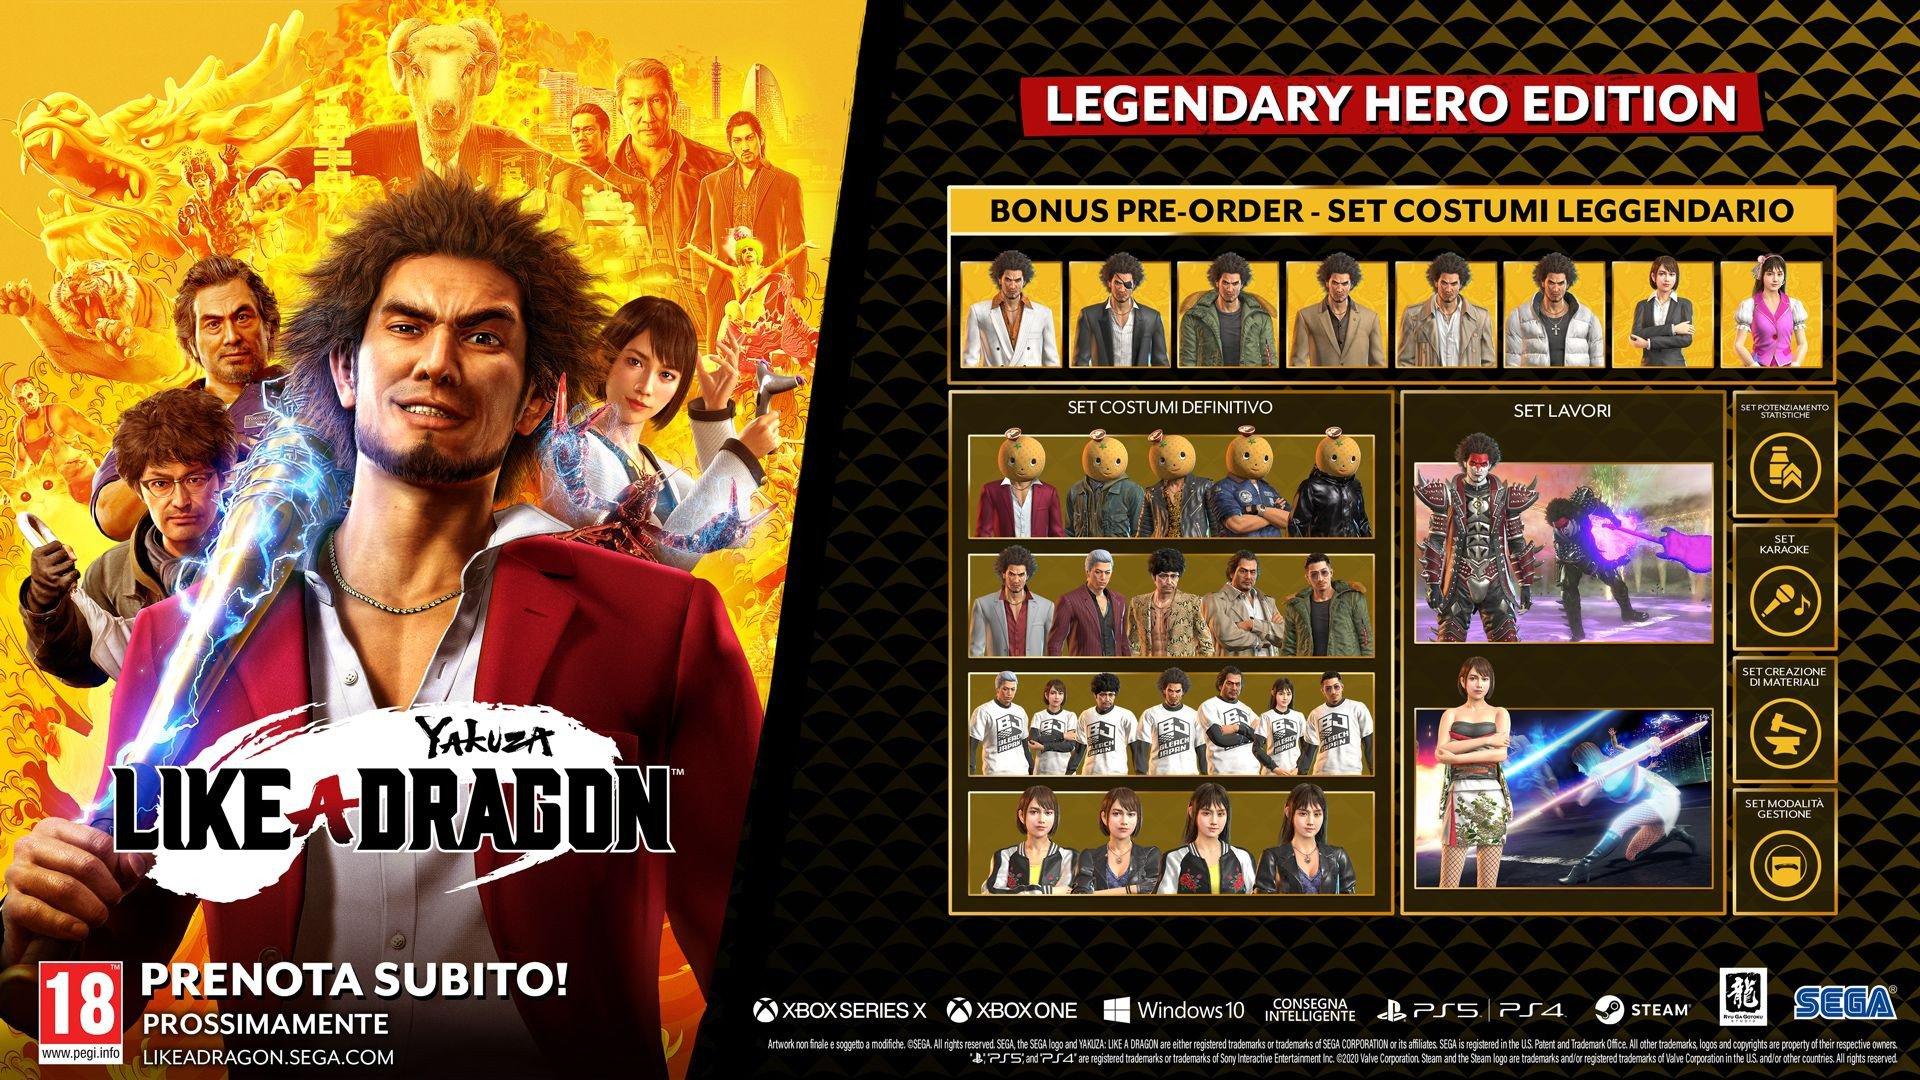 yakuza-like-dragon-v1-647398.jpg